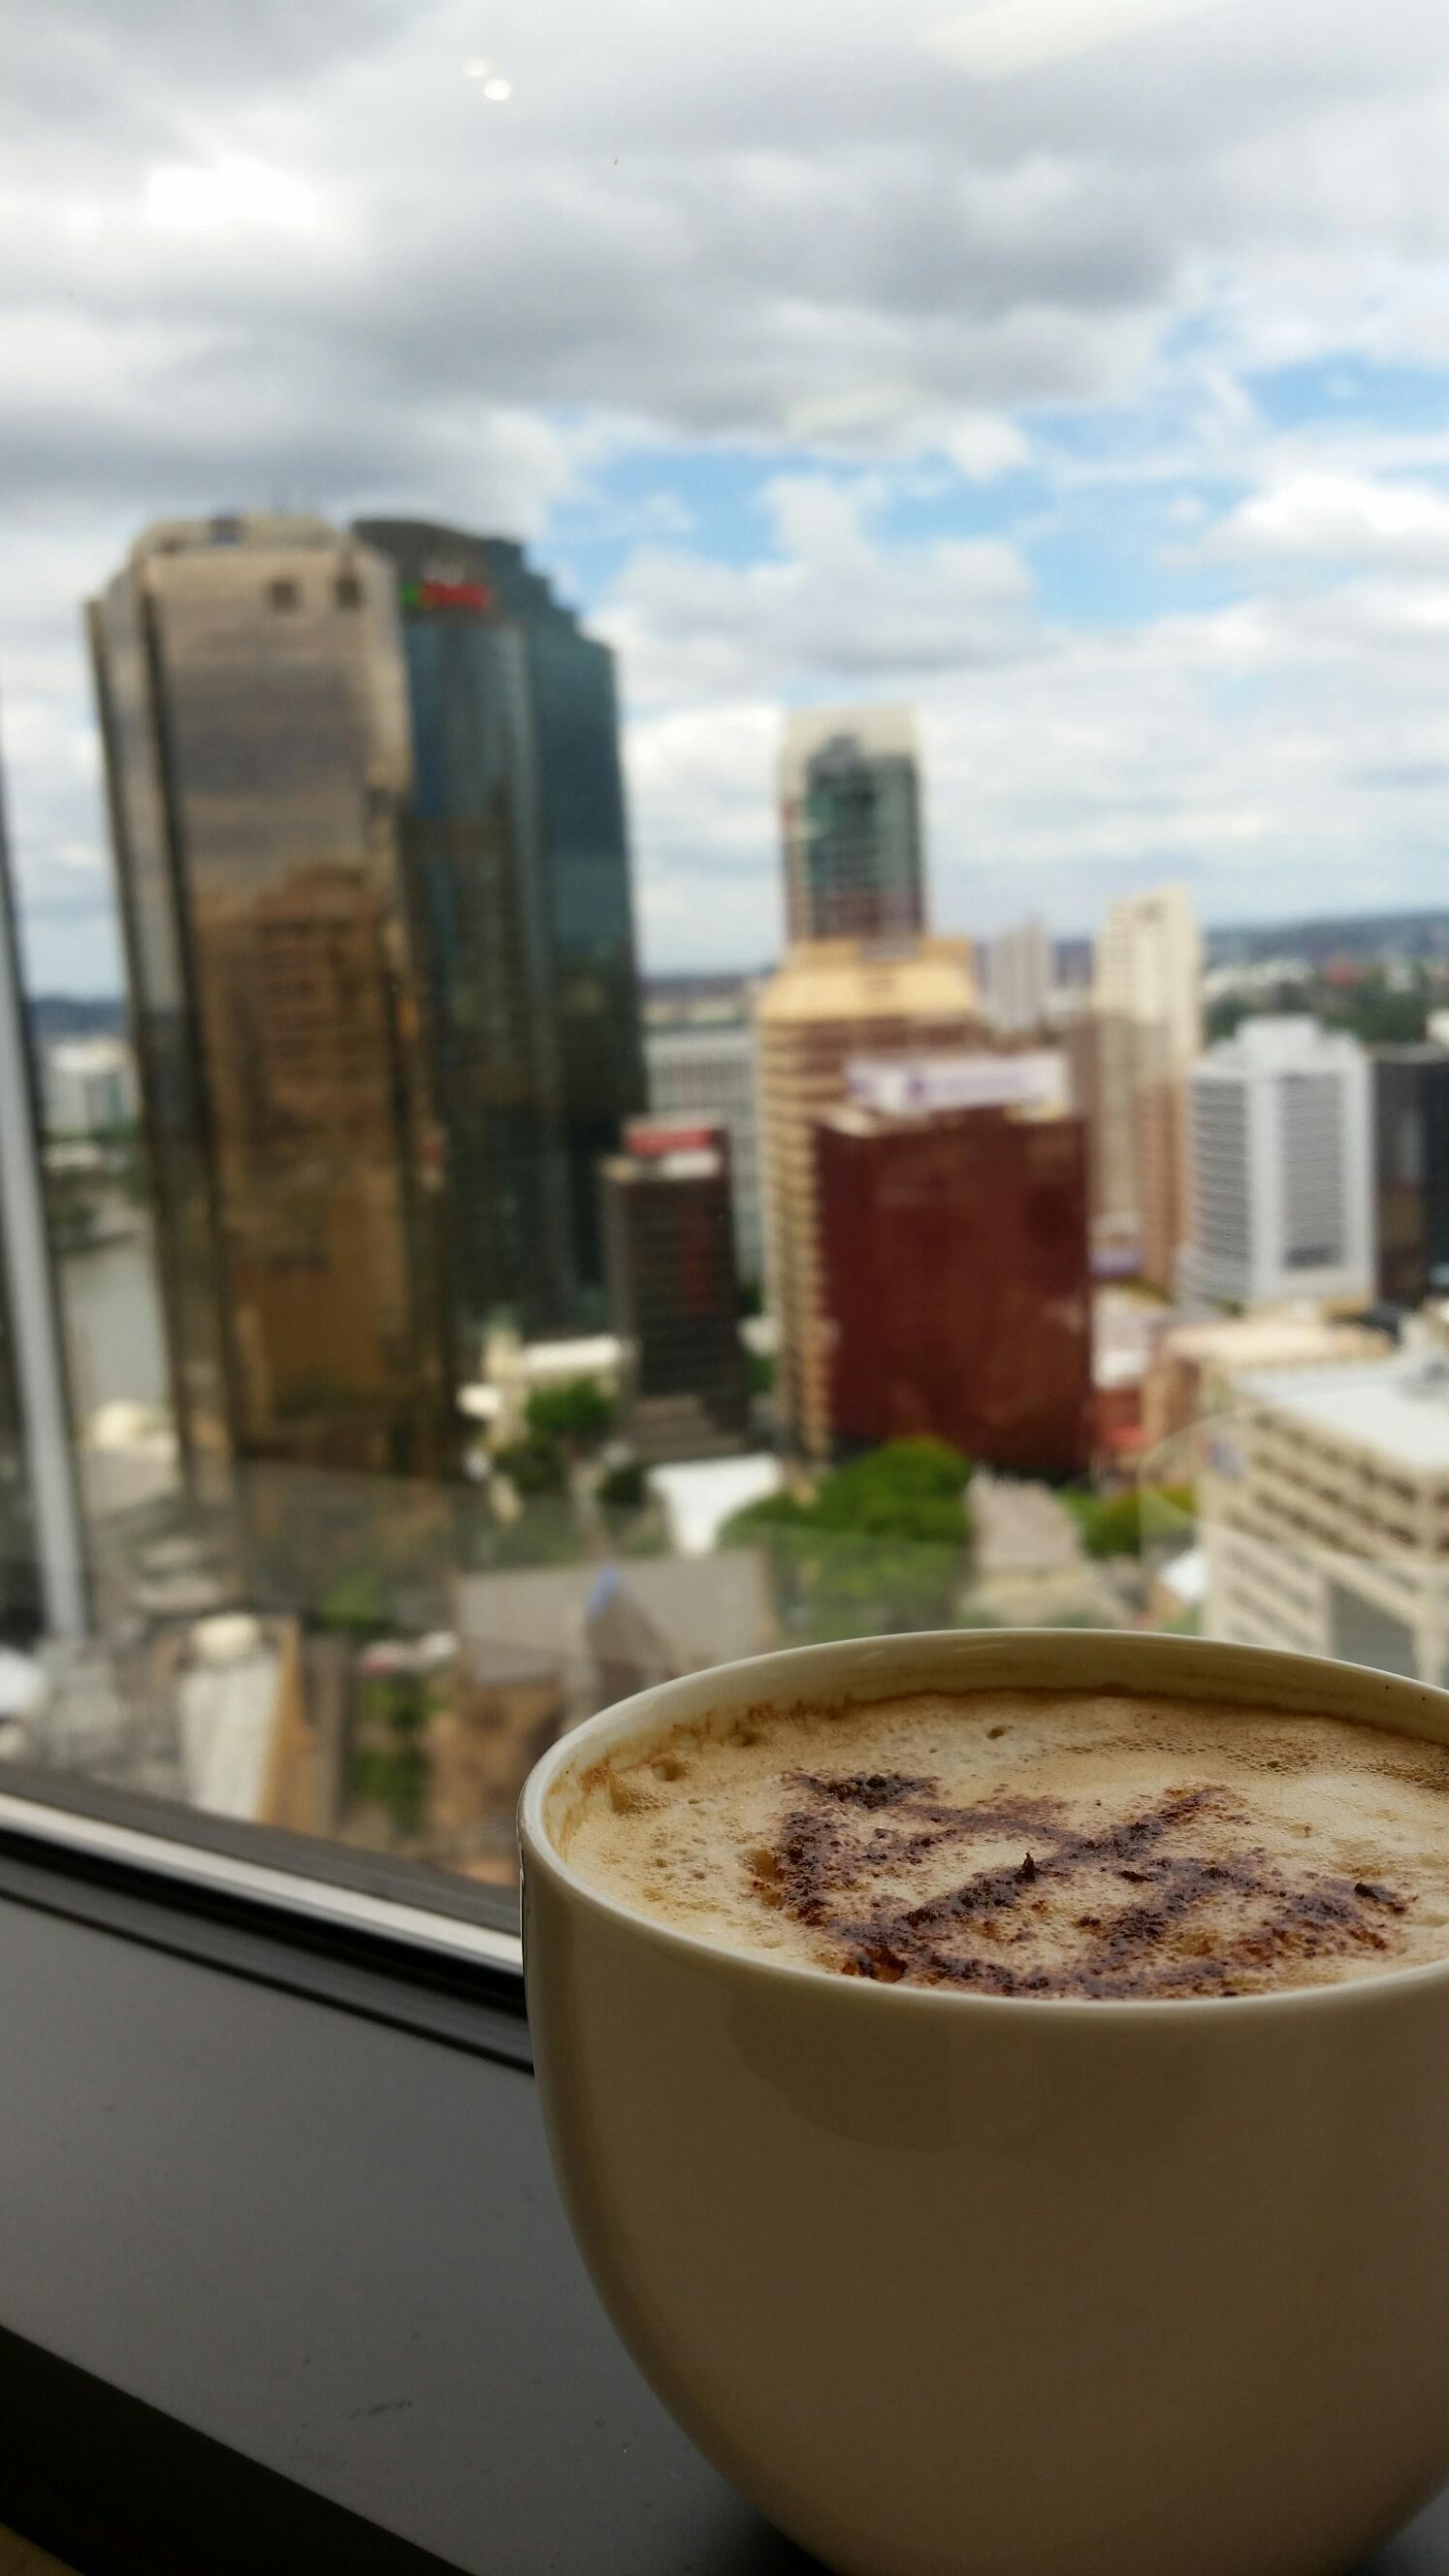 Coffee cup on sill 4.jpg